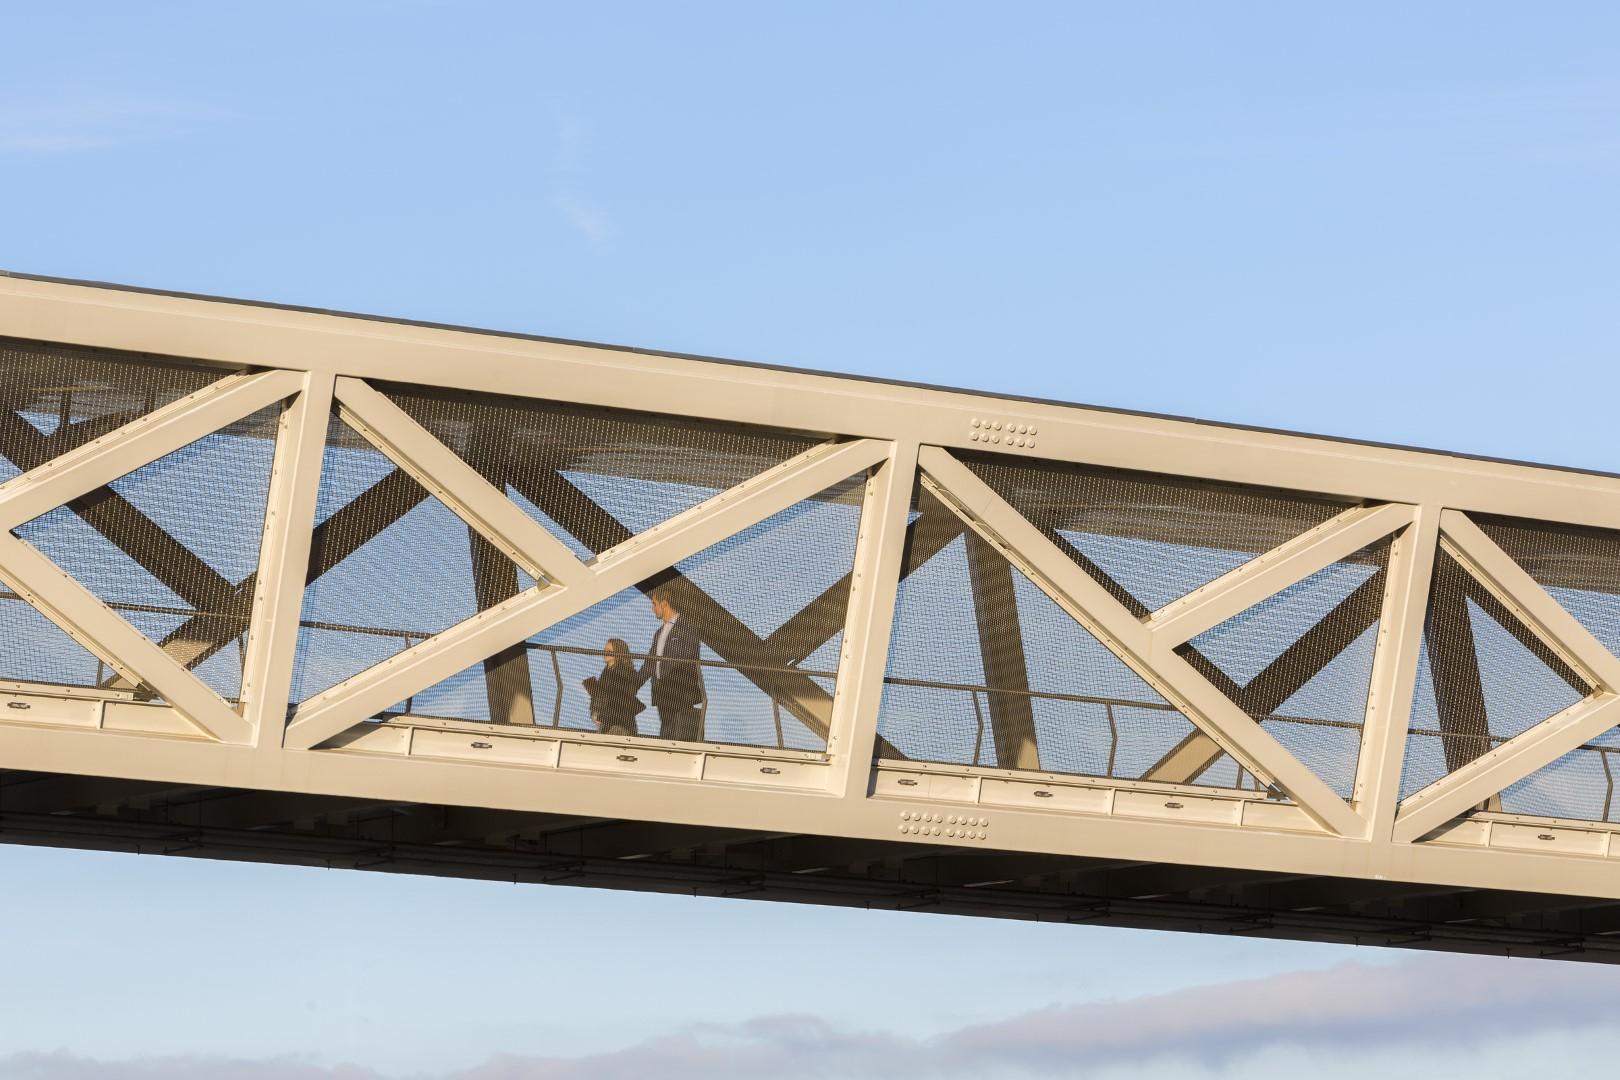 FPZ-44 wire mesh for Pedestrian Bridge enclosure